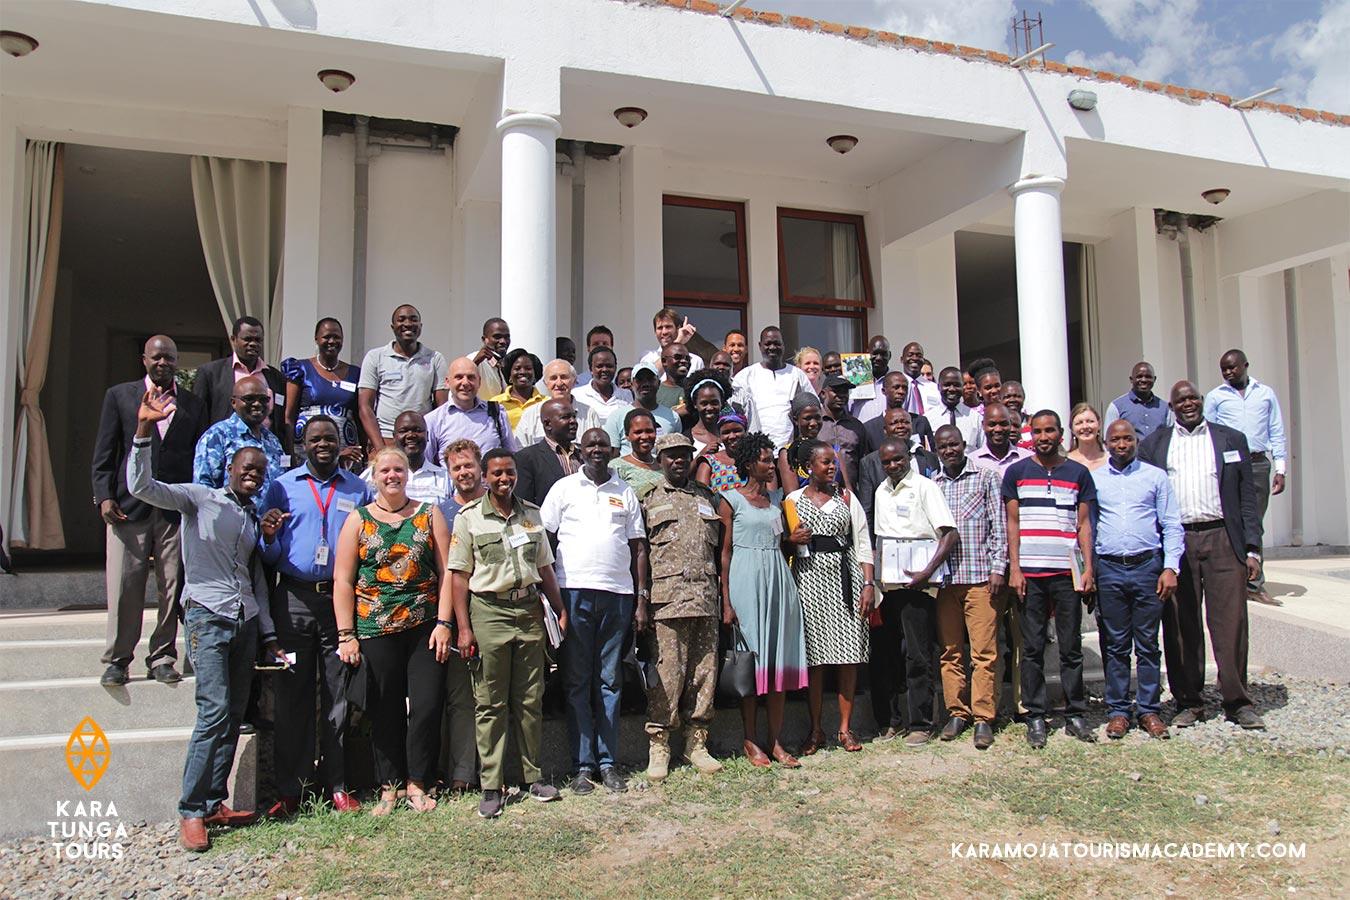 kara-tunga-karamoja-tourism-academy-stakeholder-meeting-9